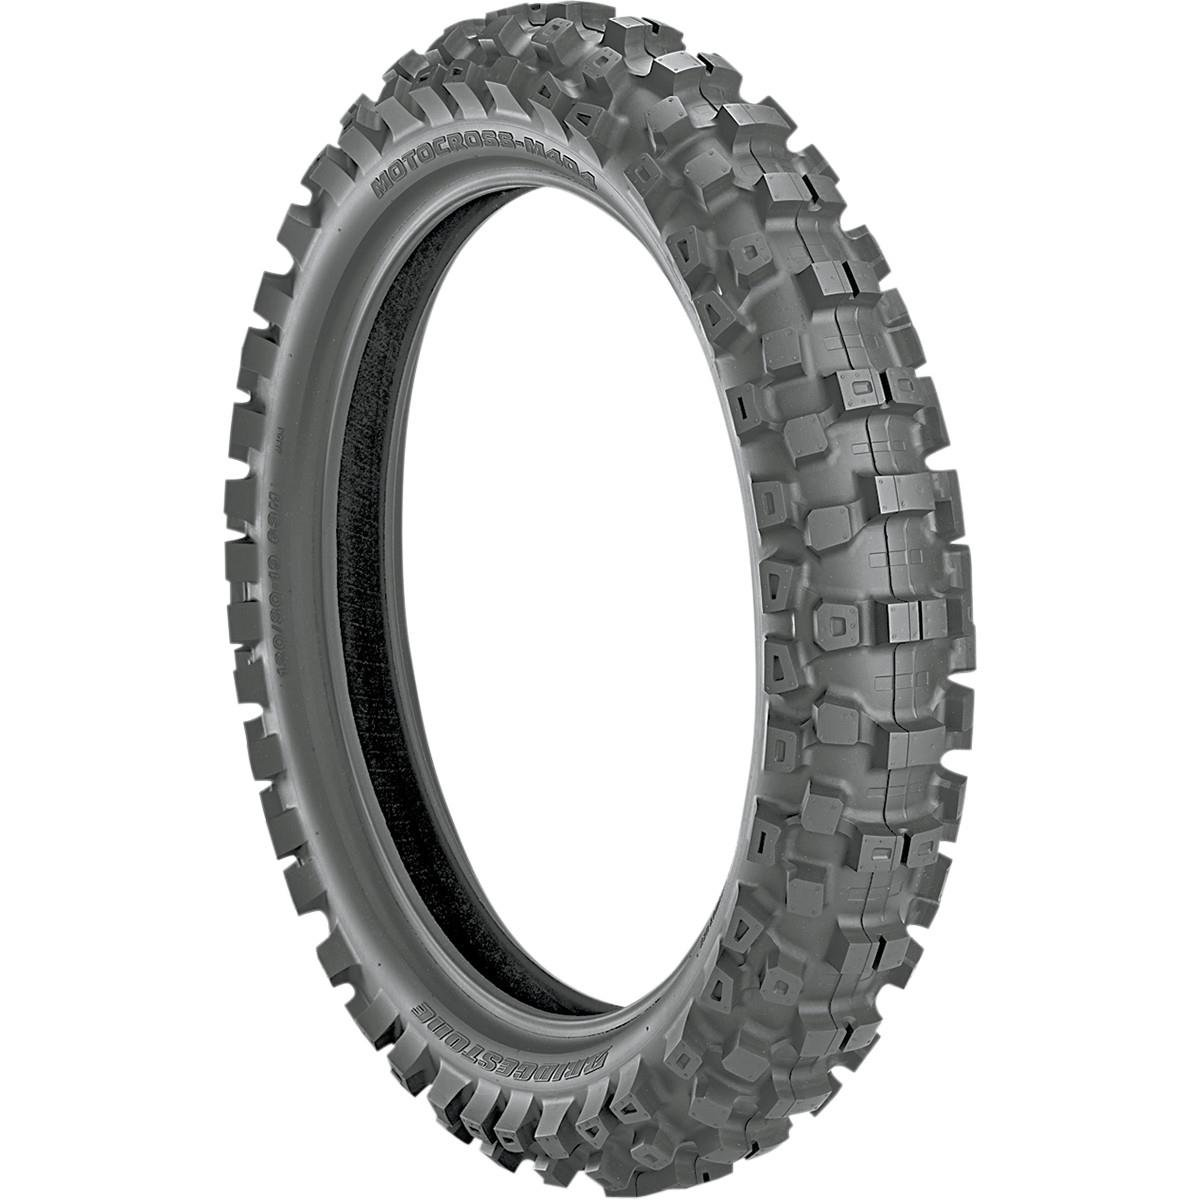 Bridgestone M404 Motocross Rear Tire 100/100-18